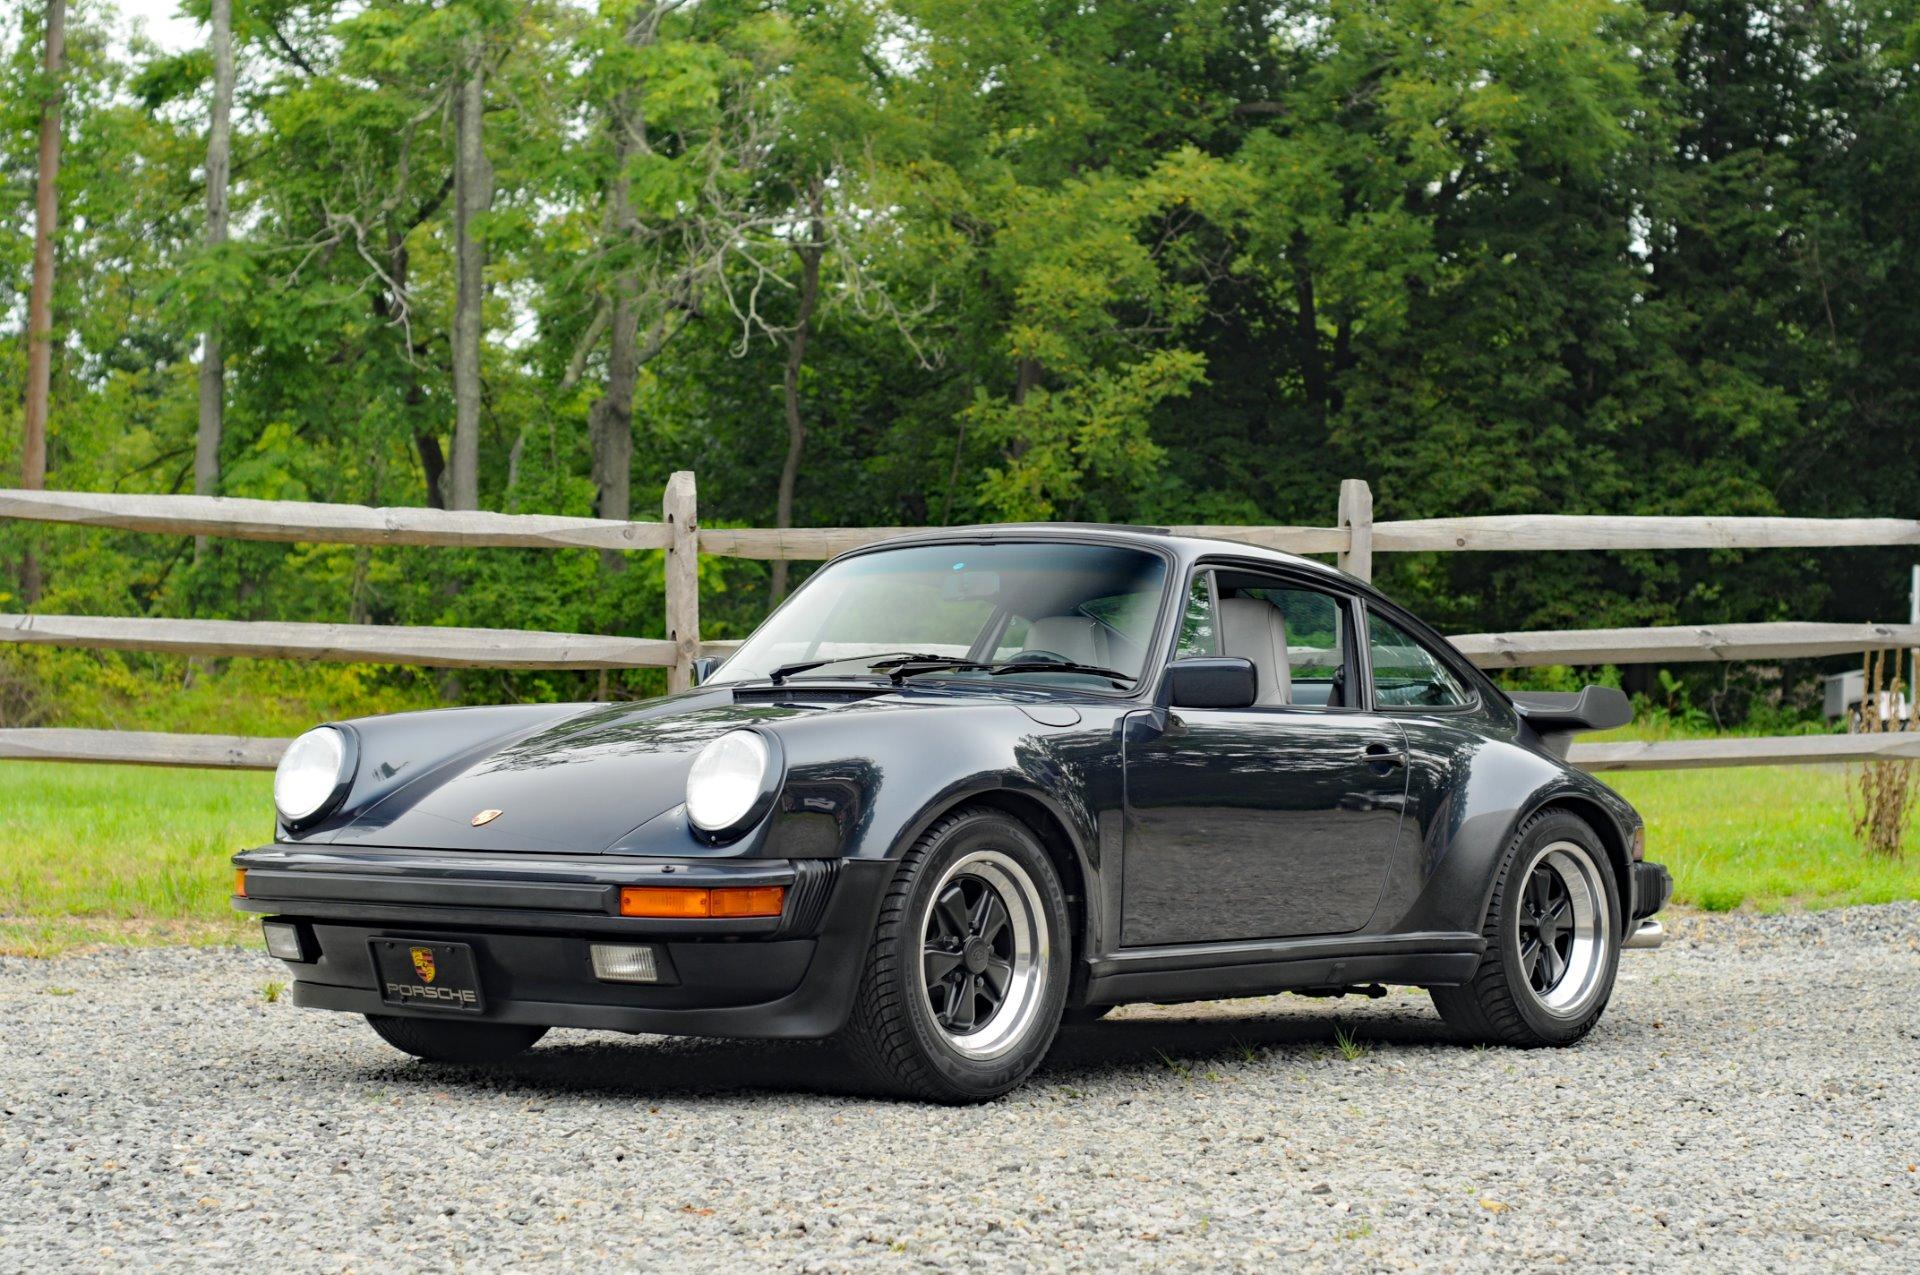 1988 Porsche 911 >> 1988 Porsche 911 Turbo Carrera Turbo